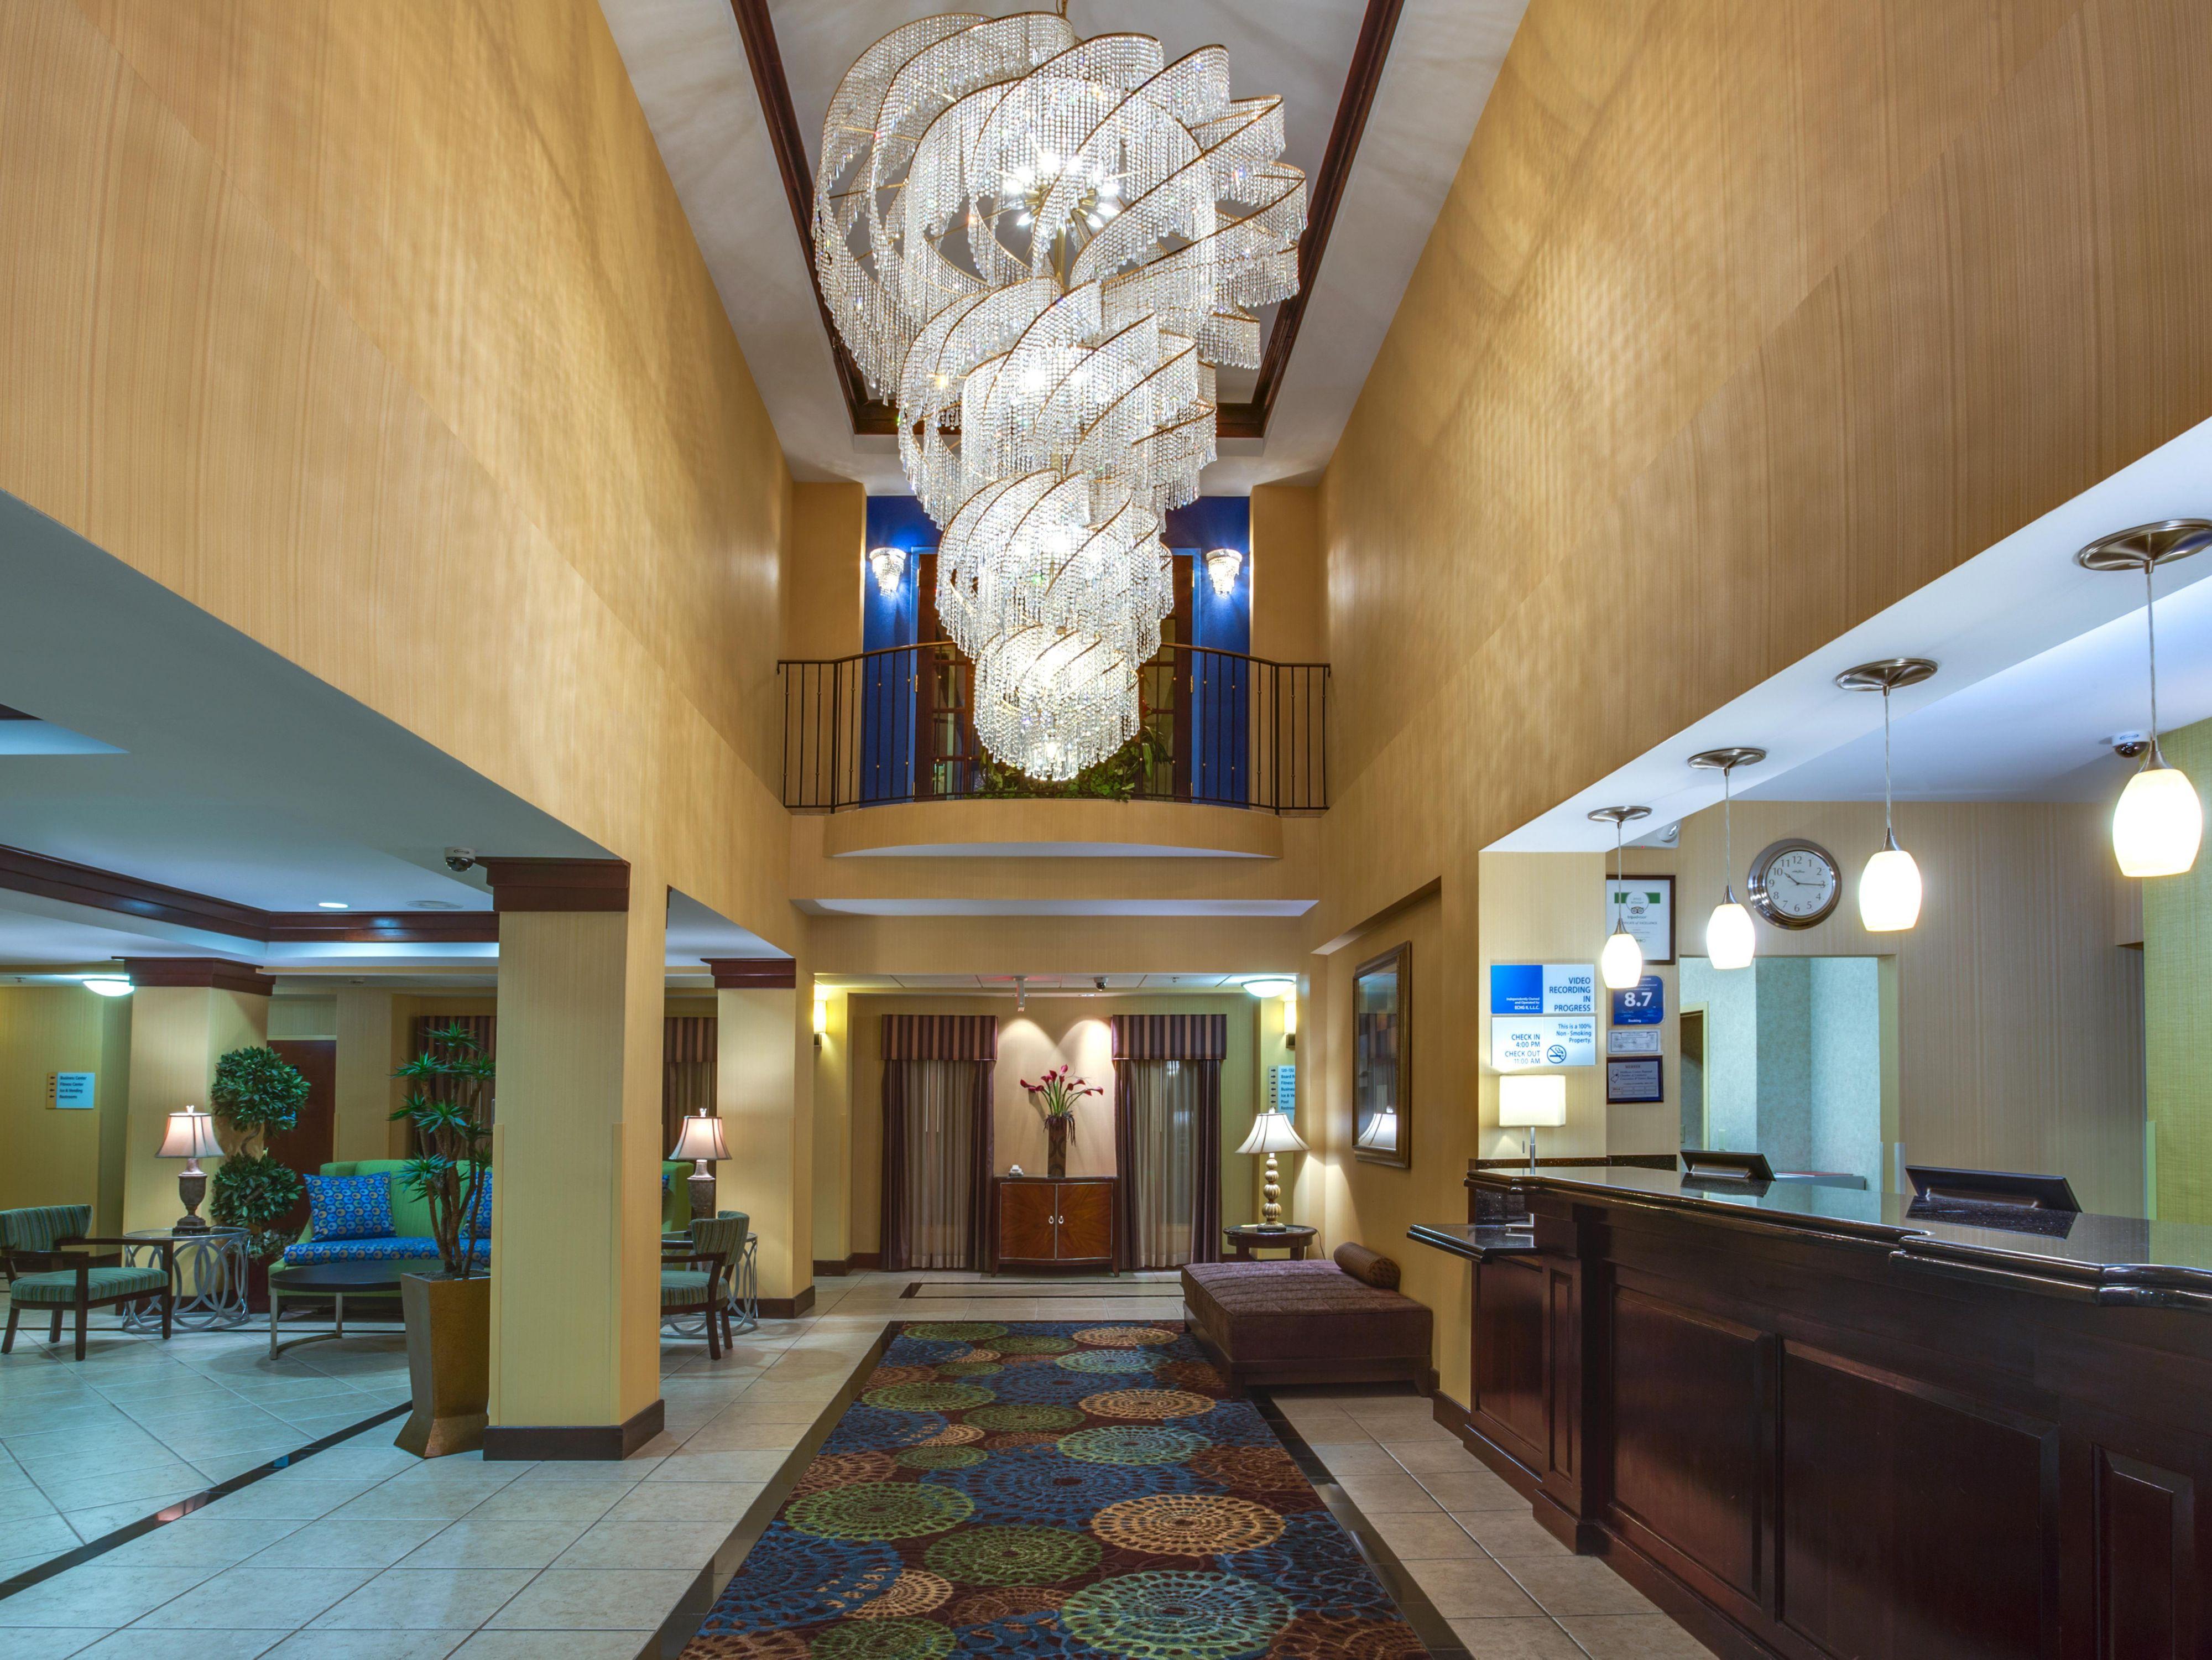 Candlewood Suites Morris Plains Long Term Stay Hotels